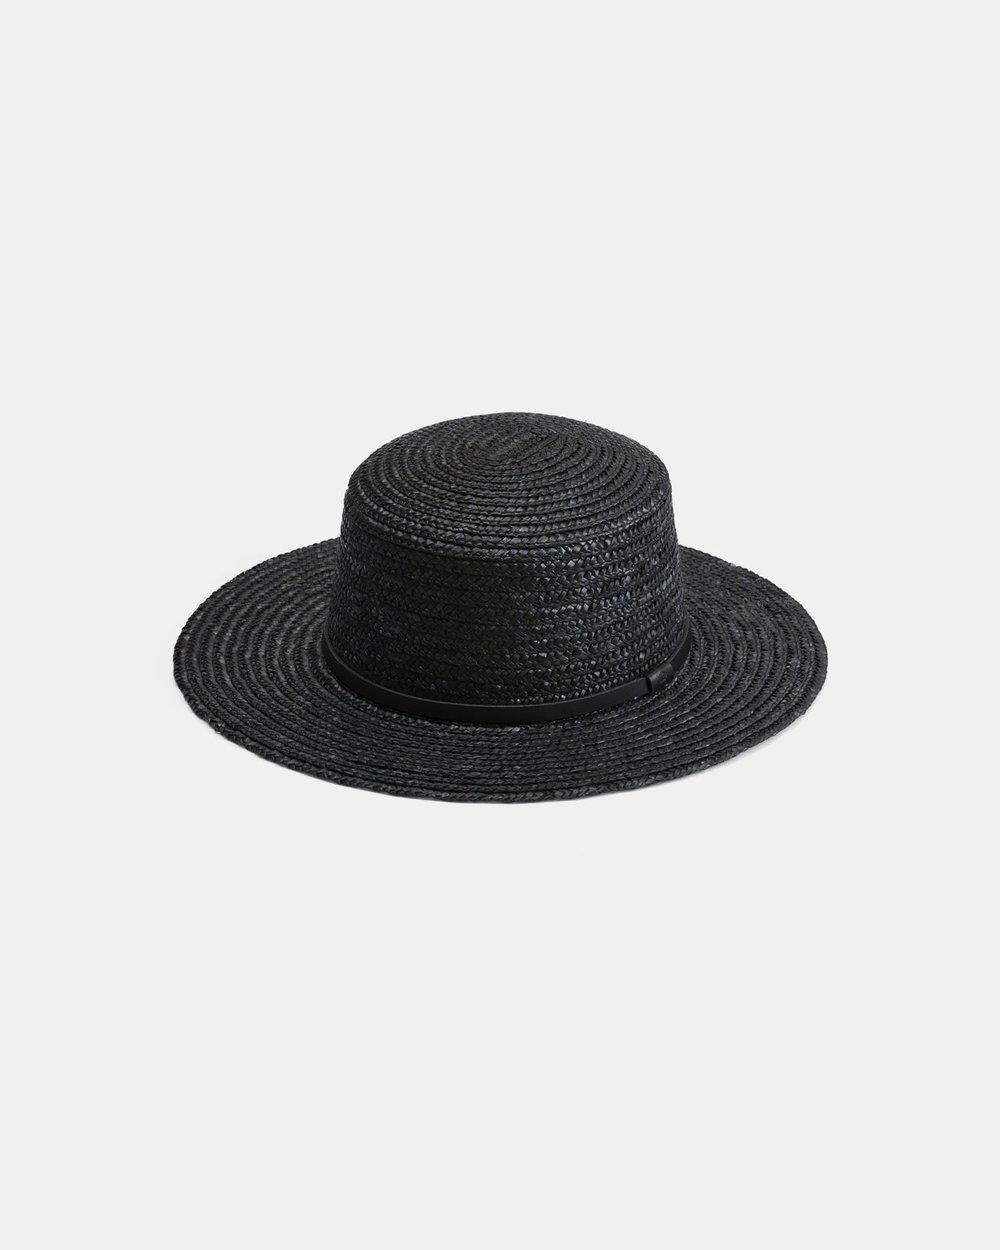 will-and-bear-harvey-black-straw-hat-1.jpg